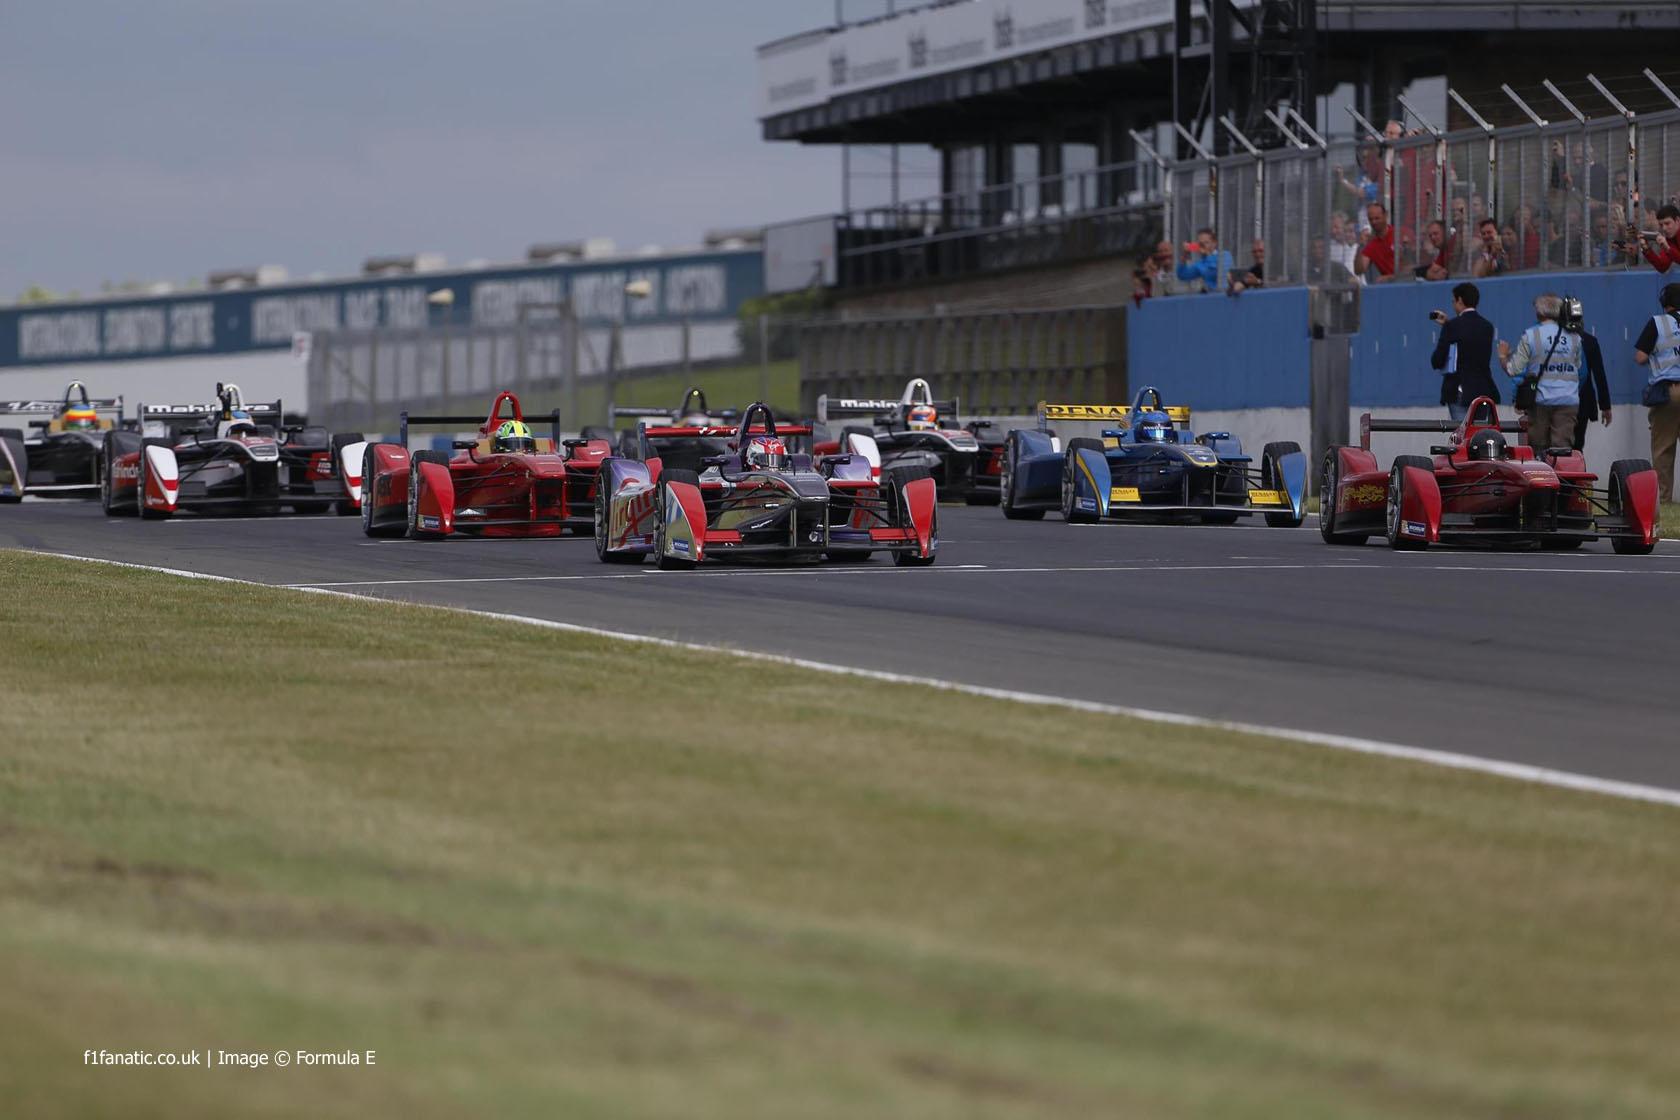 Formula E cars, Donington Park, 2014